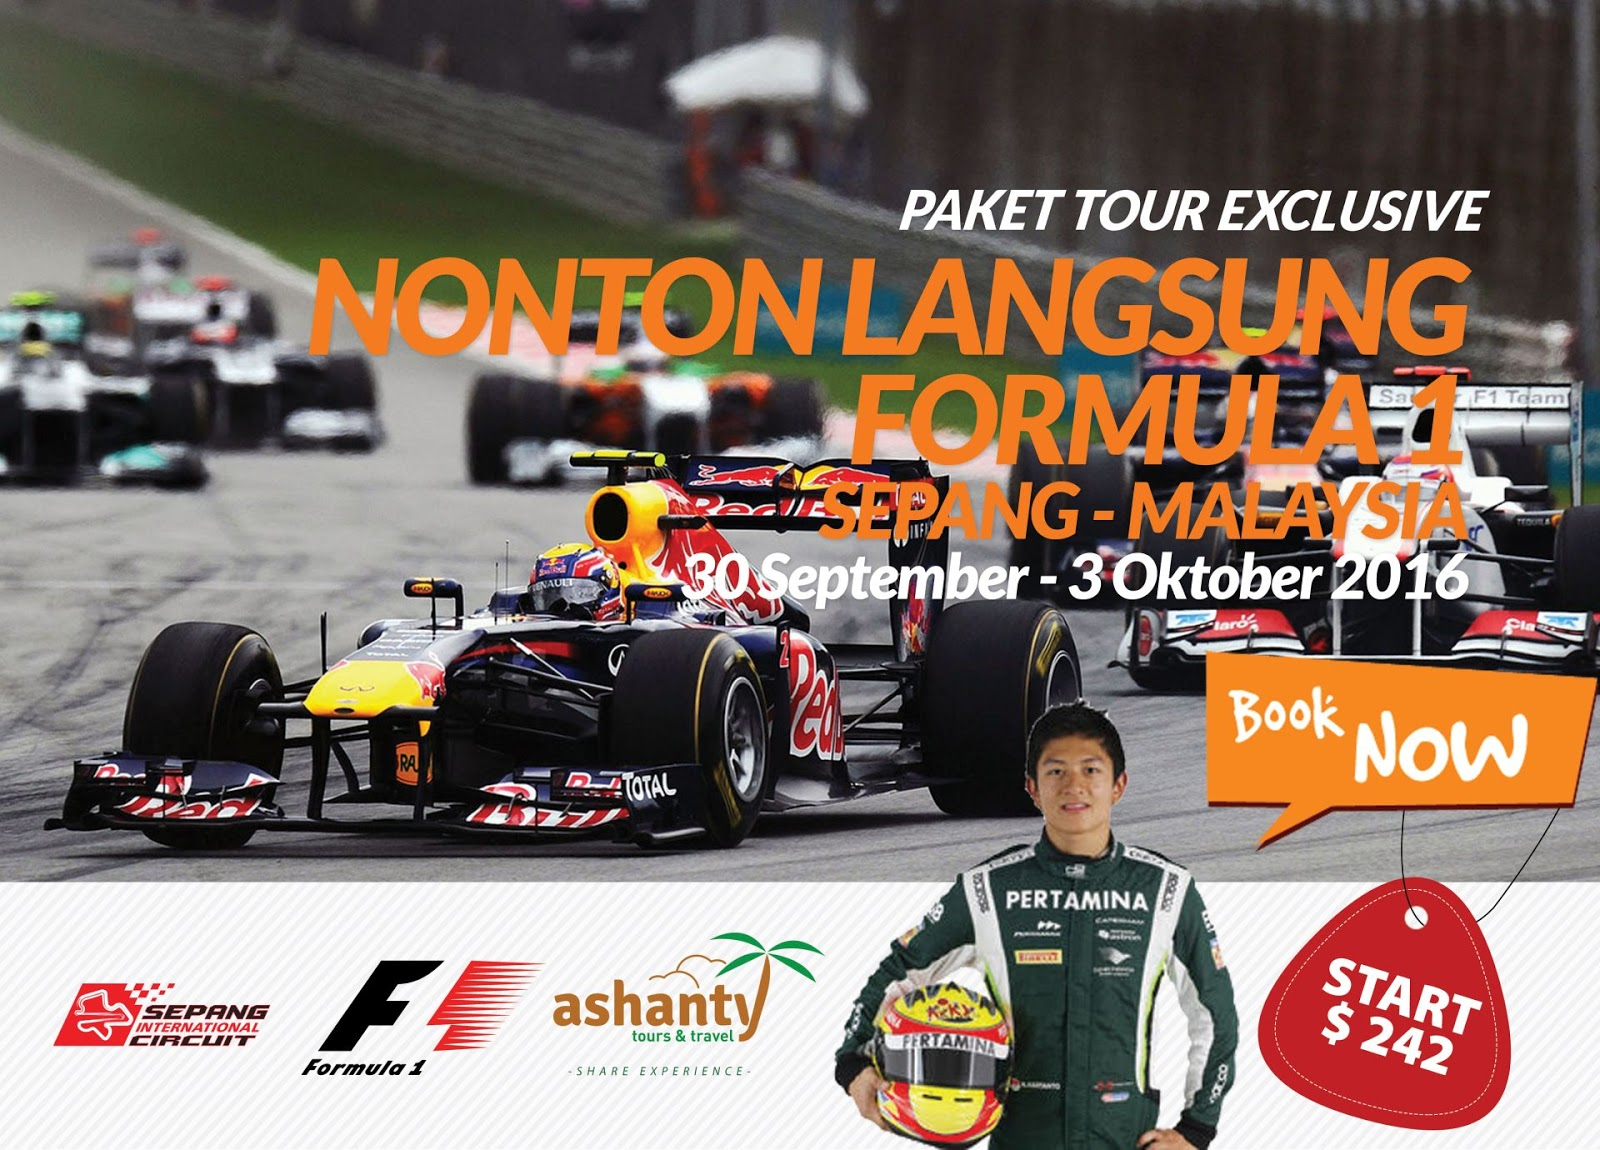 paket tour f1 sepang malaysia 2016, harga tiket f1 sepang 2016, paket tour nonton f1 malaysia 2016